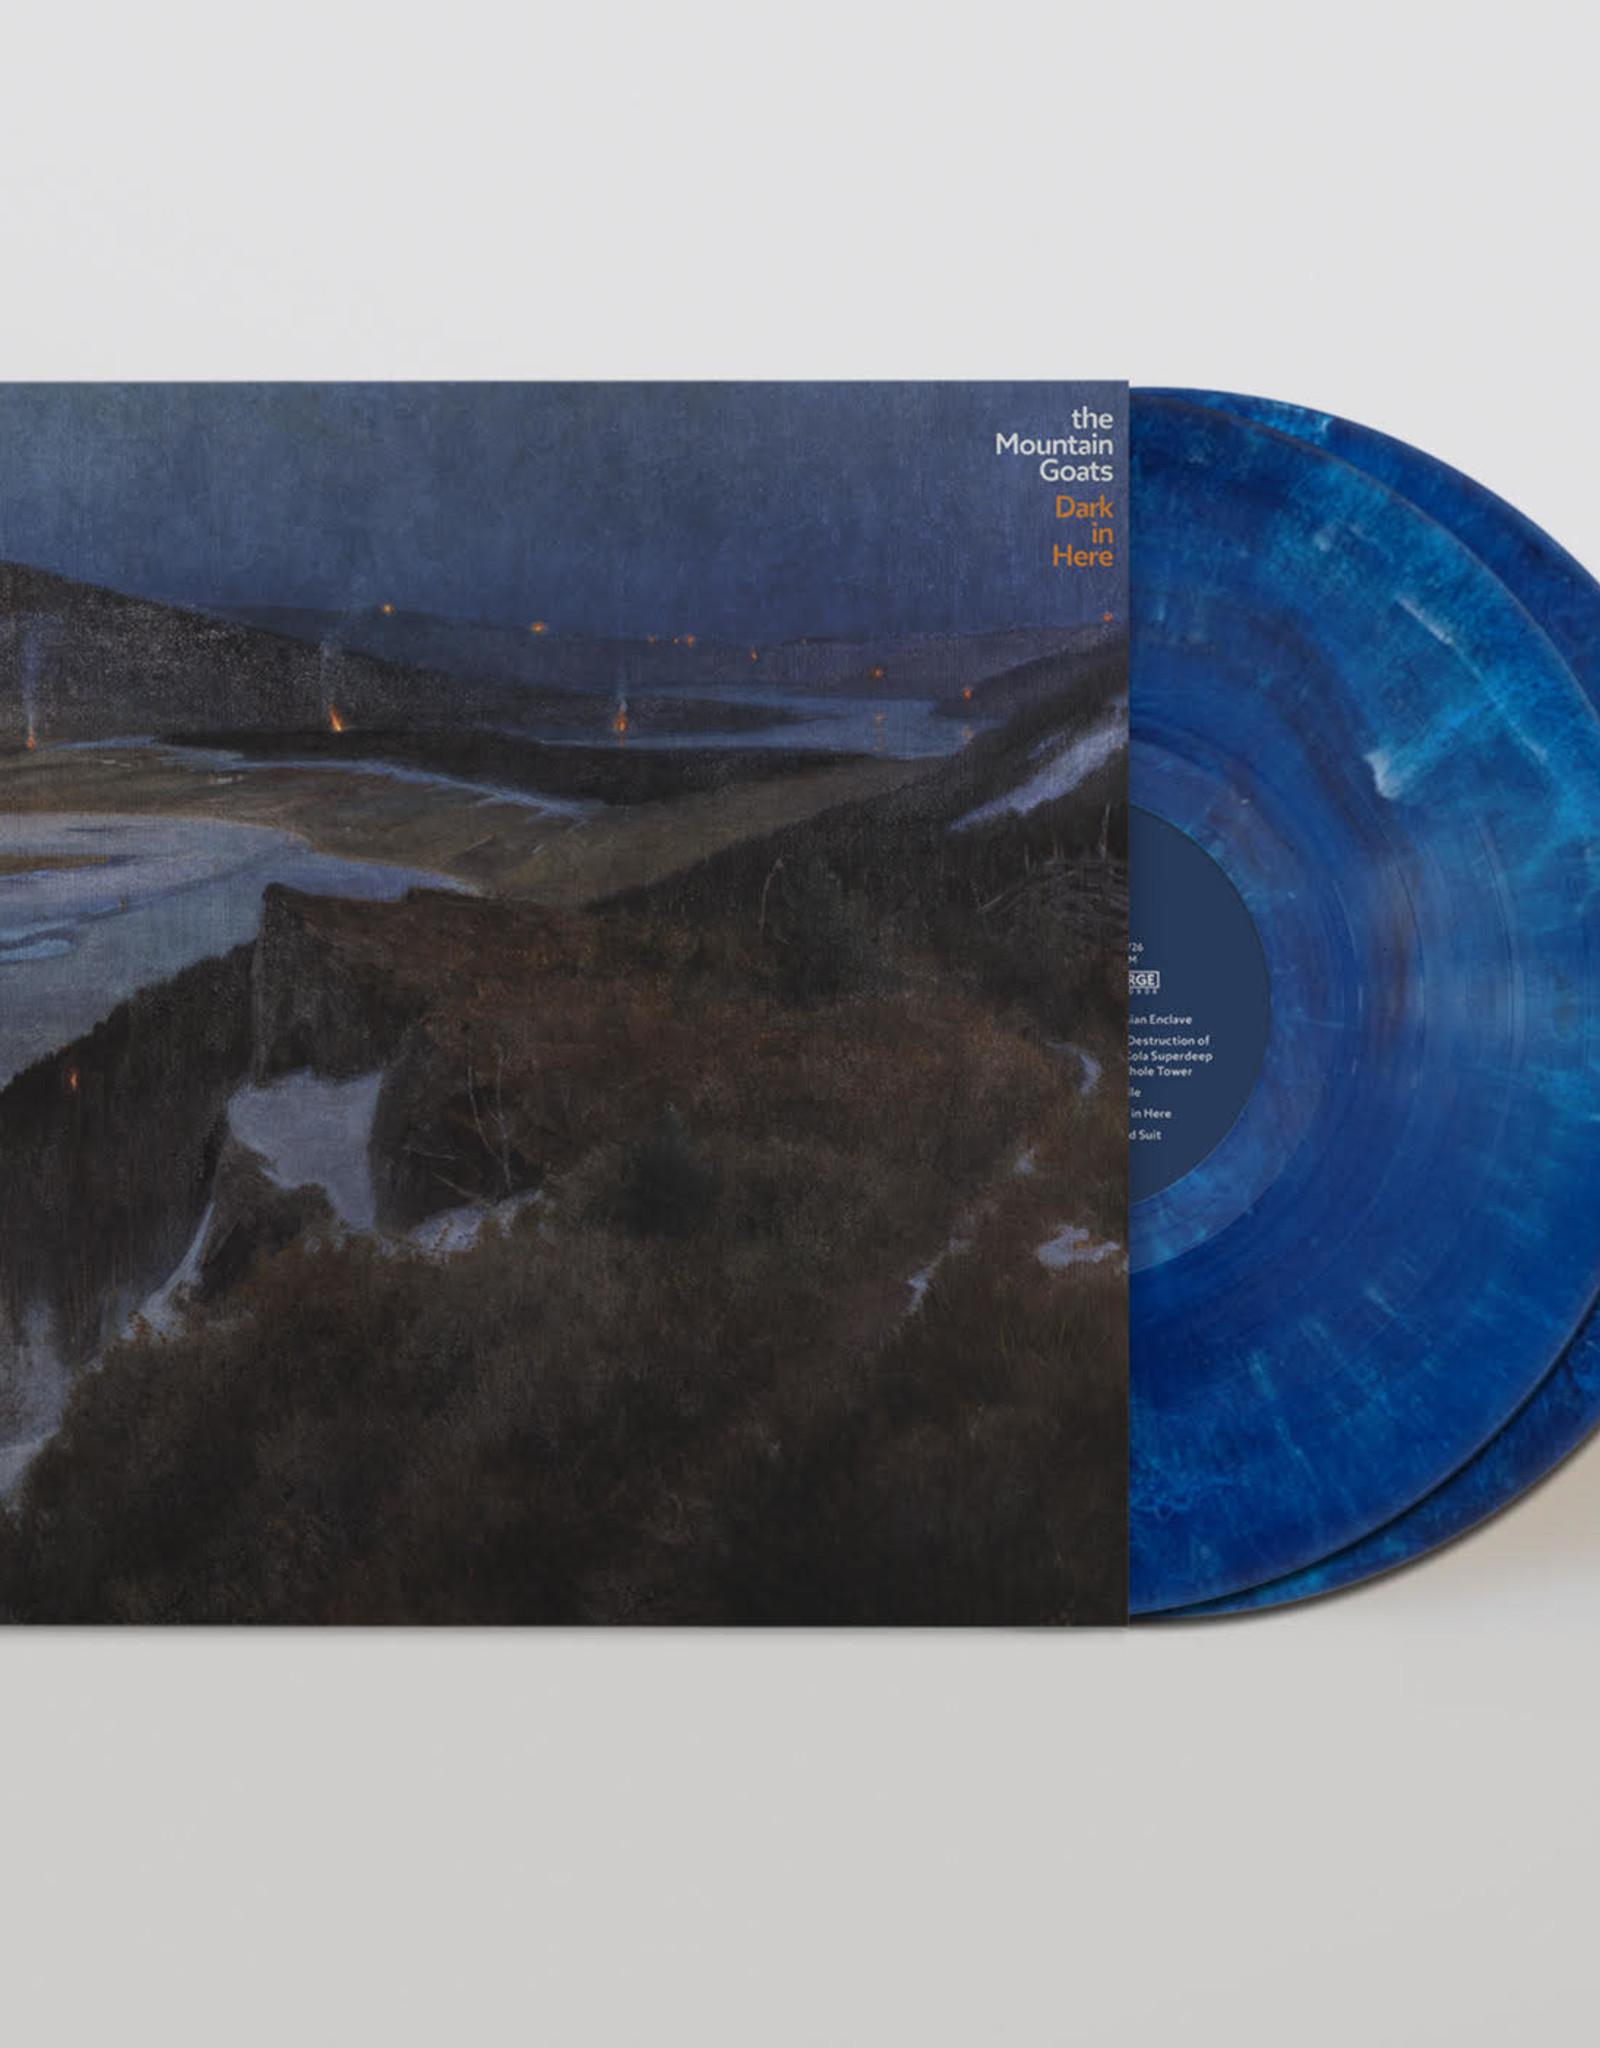 Mountain Goats - Dark in Here (Indie-Exclusive Blue Vinyl)